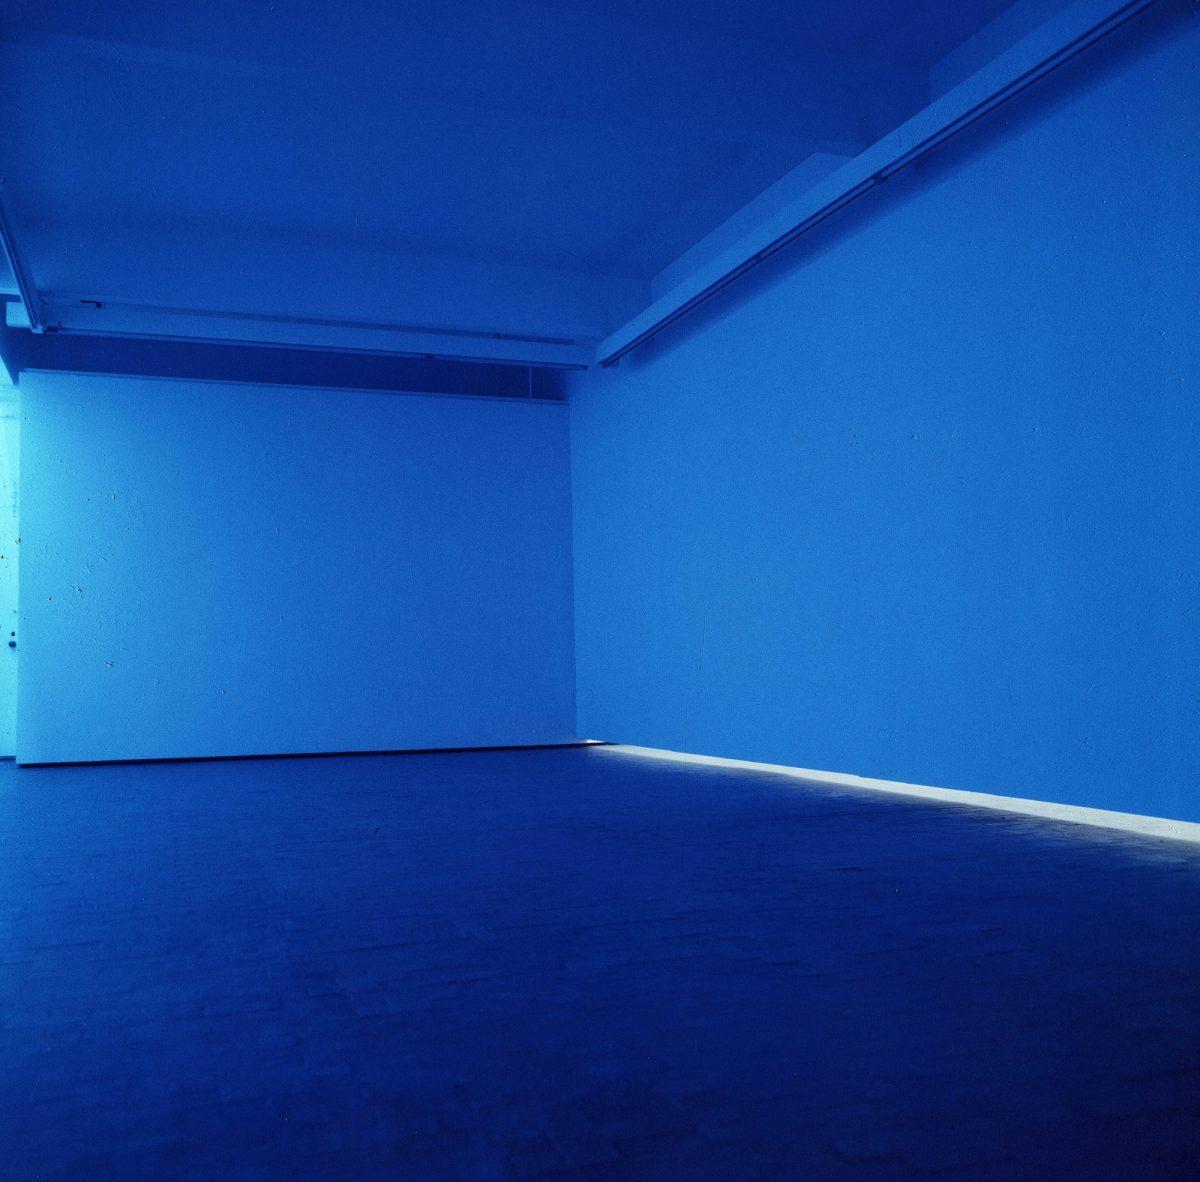 Natural Light Blue Light Room 1971 Copyright Bruce Nauman Artists Rights Society Ars New York And Dacs London 2016